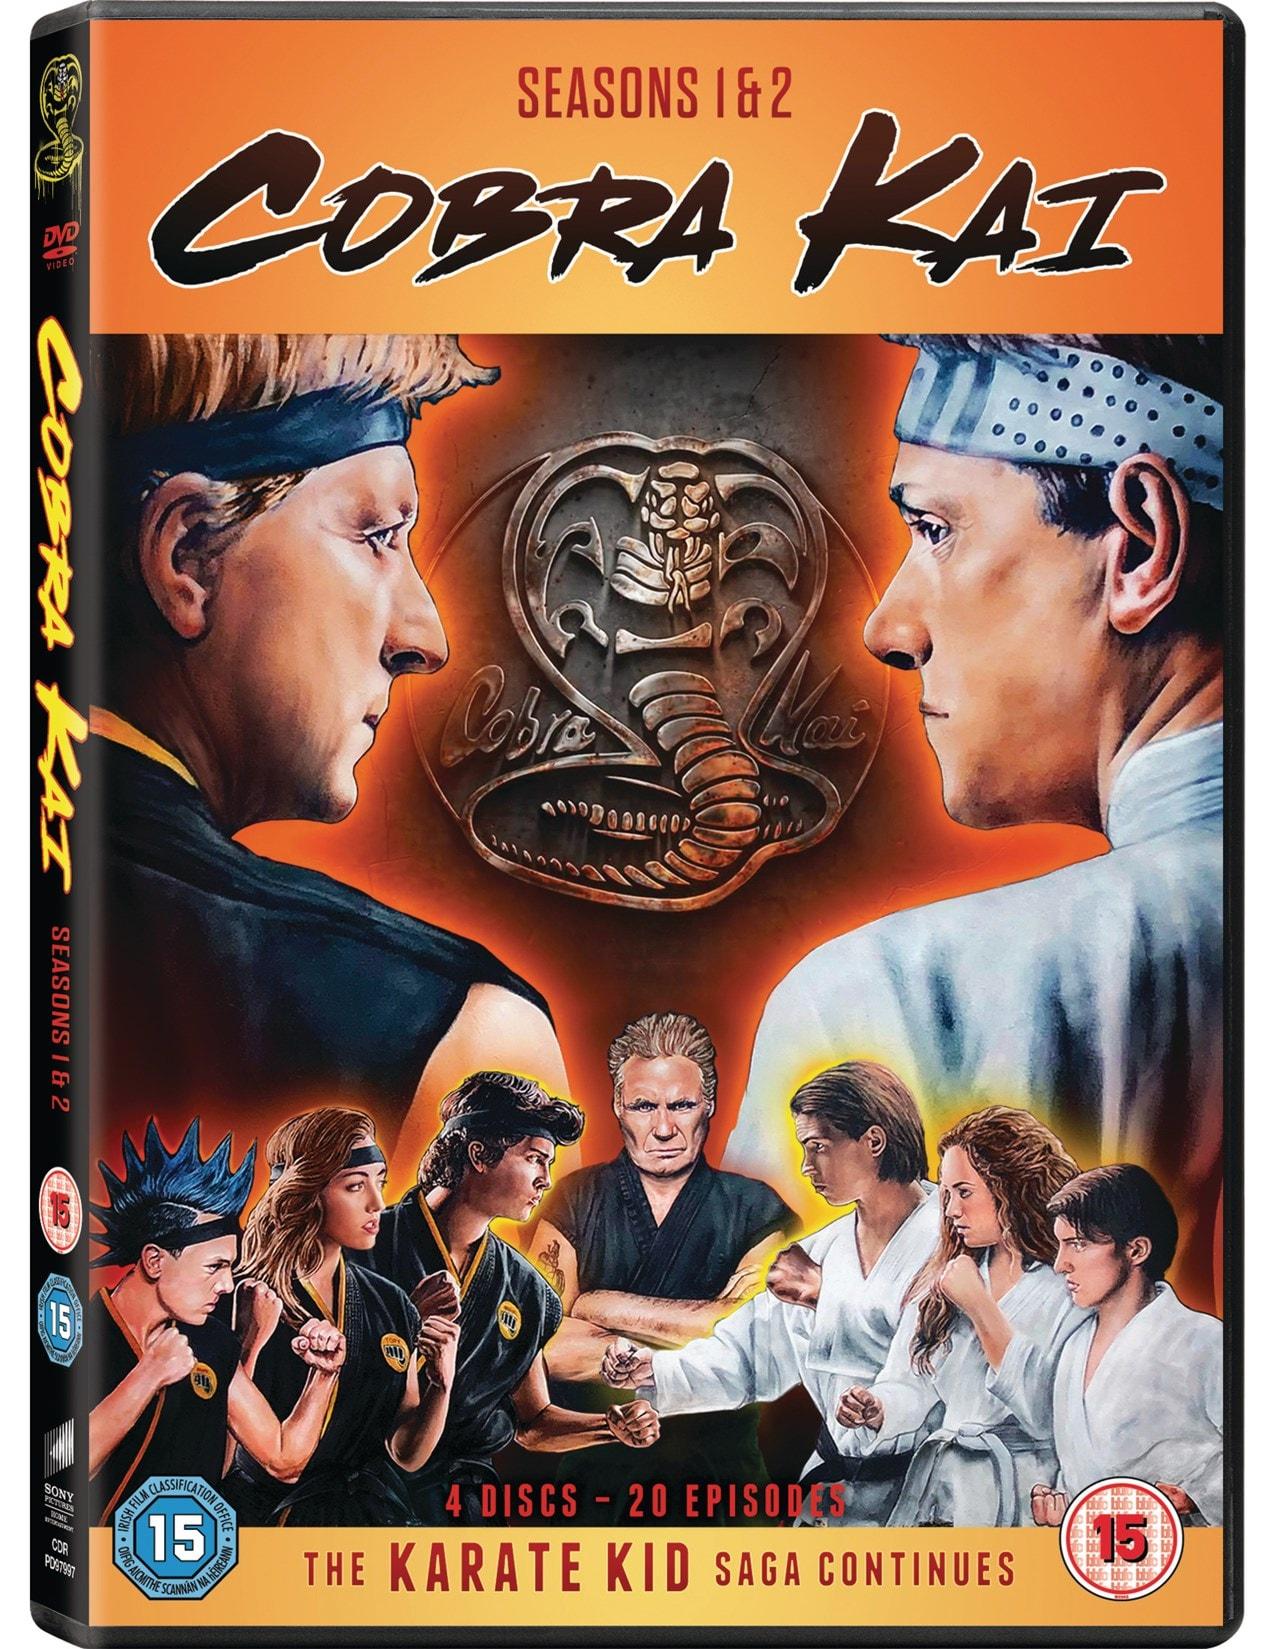 Cobra Kai: Season 1 & 2 - 2